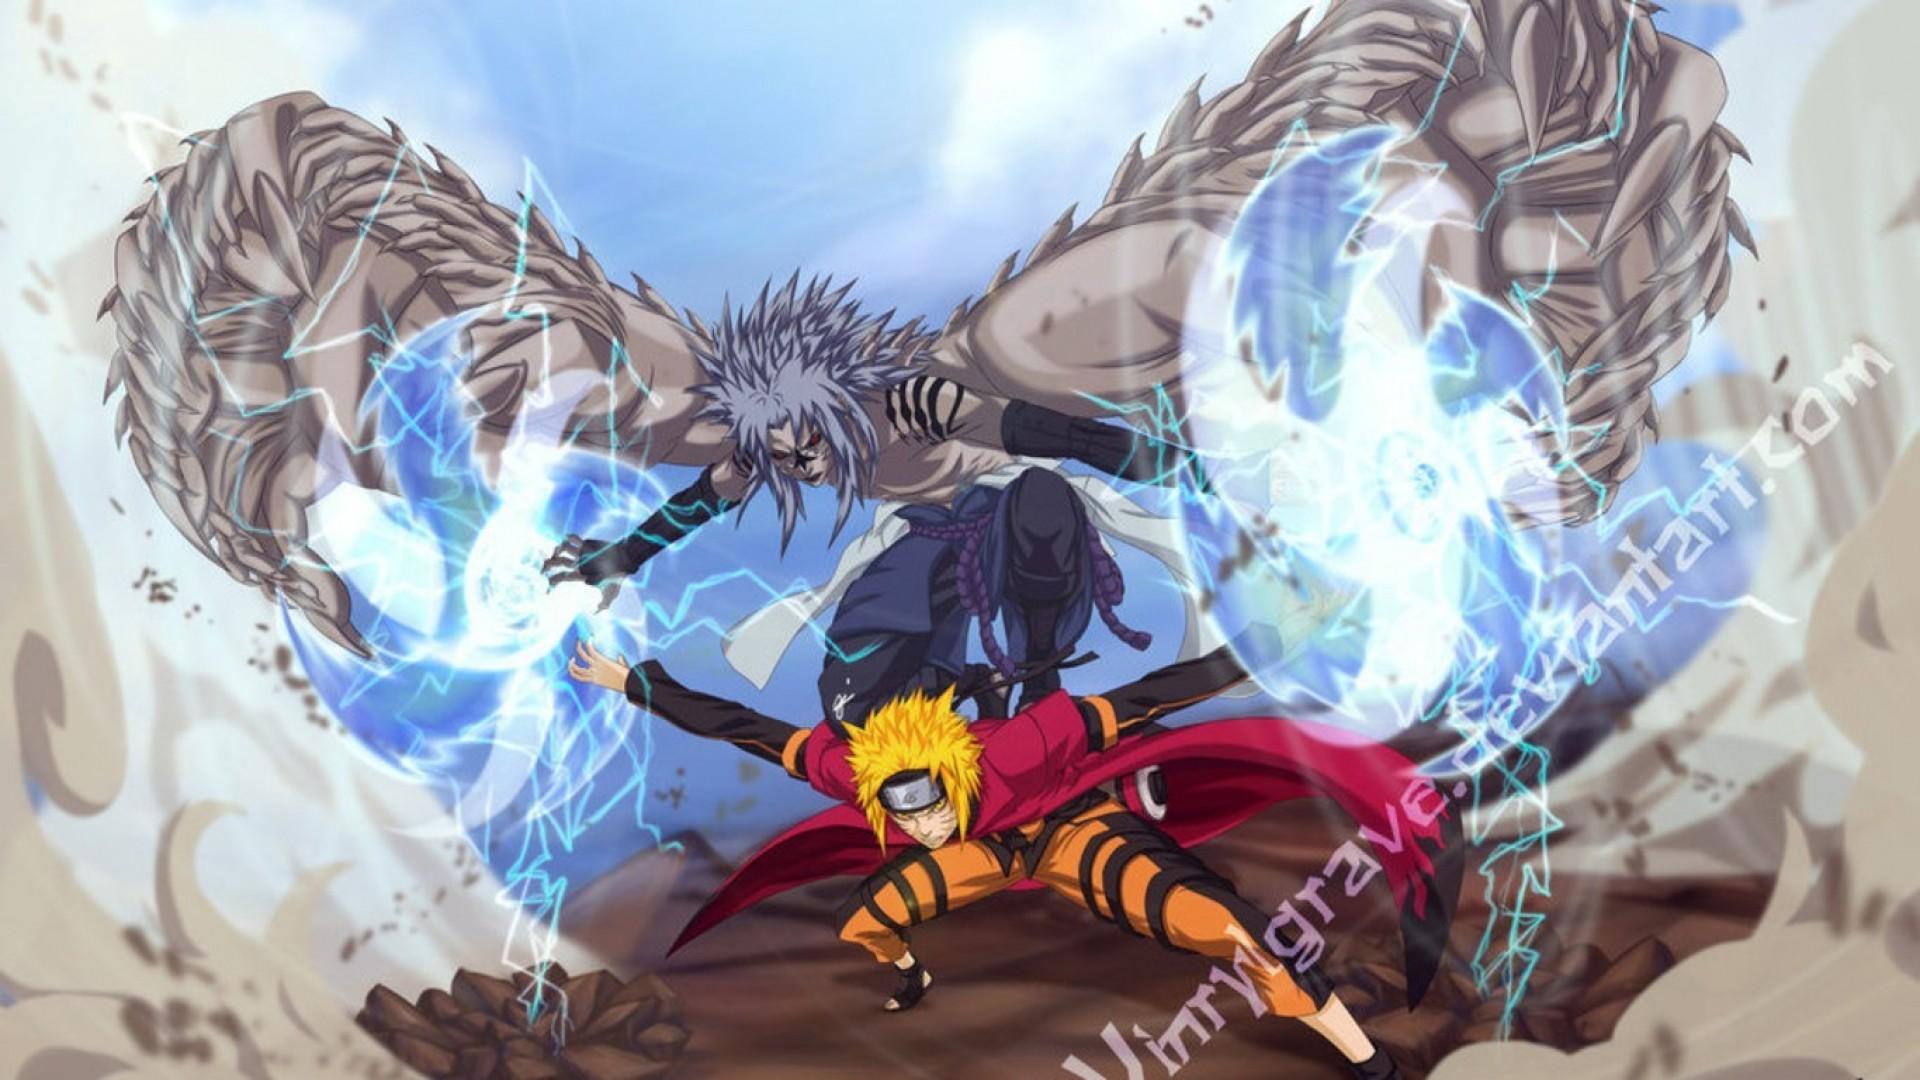 A29 Naruto Uzumaki anime HD Desktop background wallpapers downloads